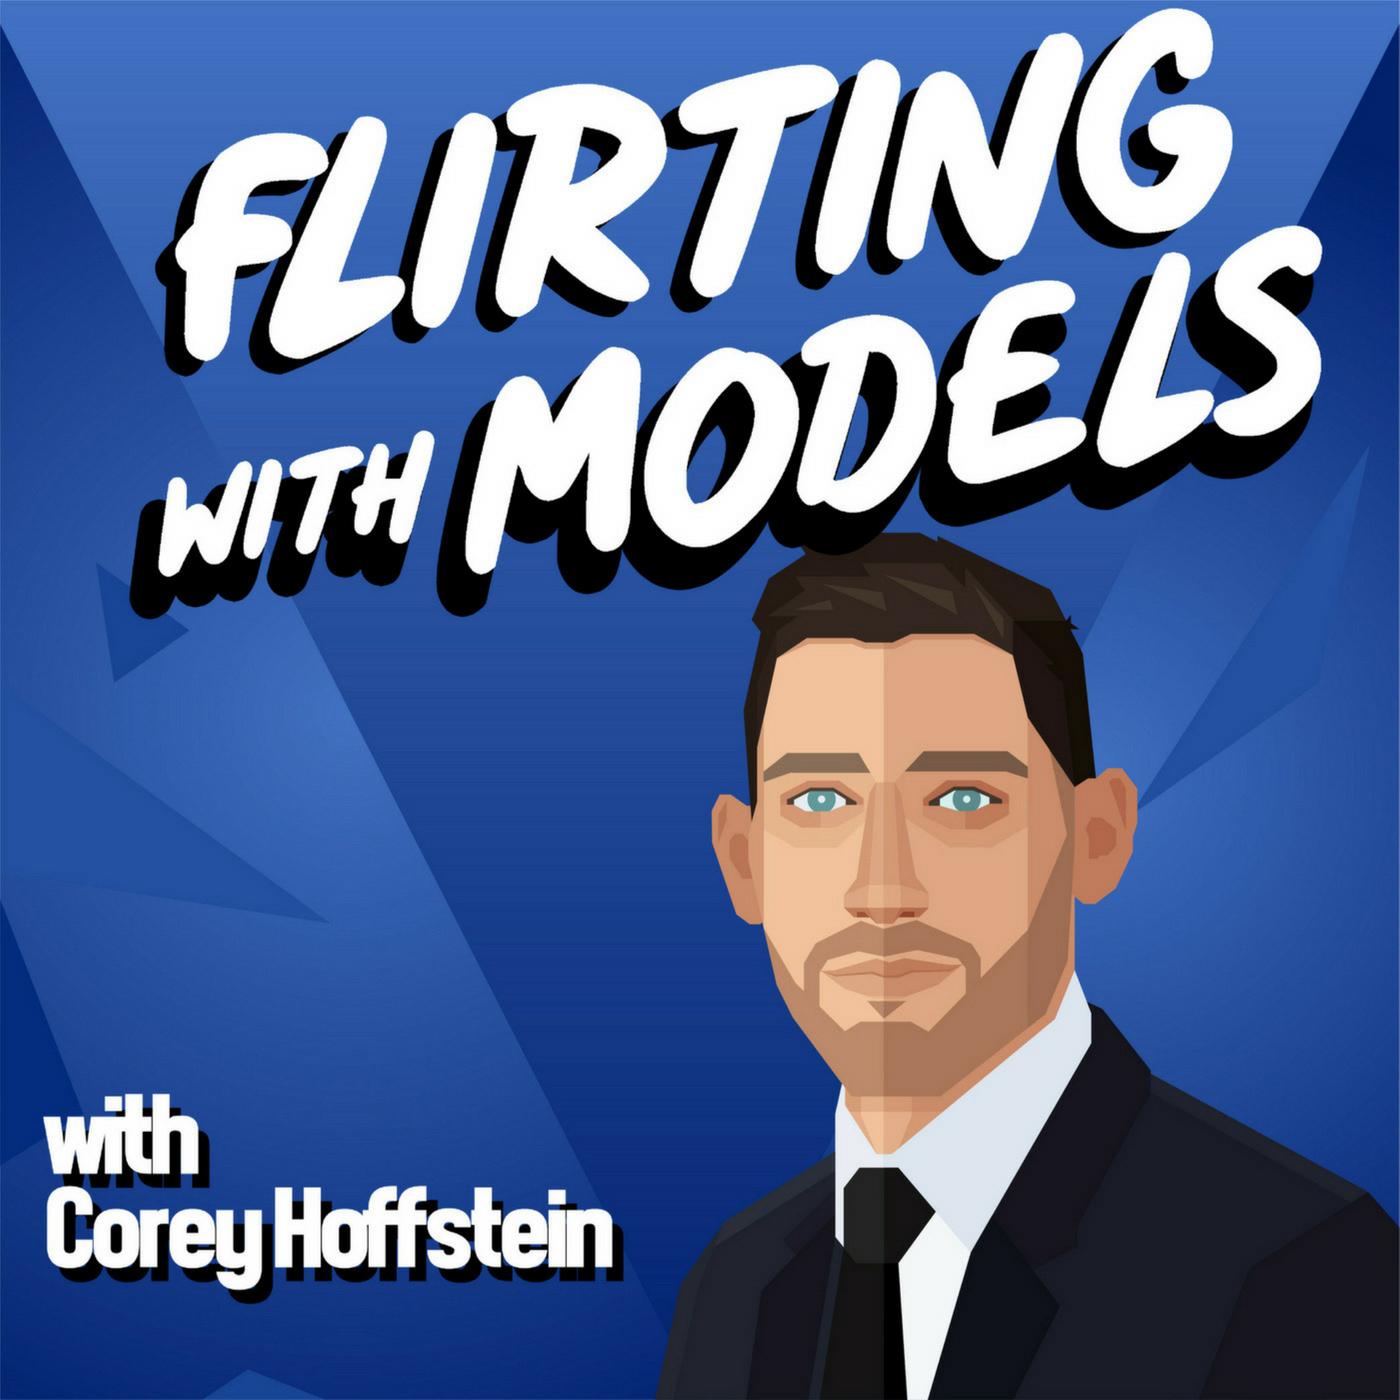 Flirting with Models show art